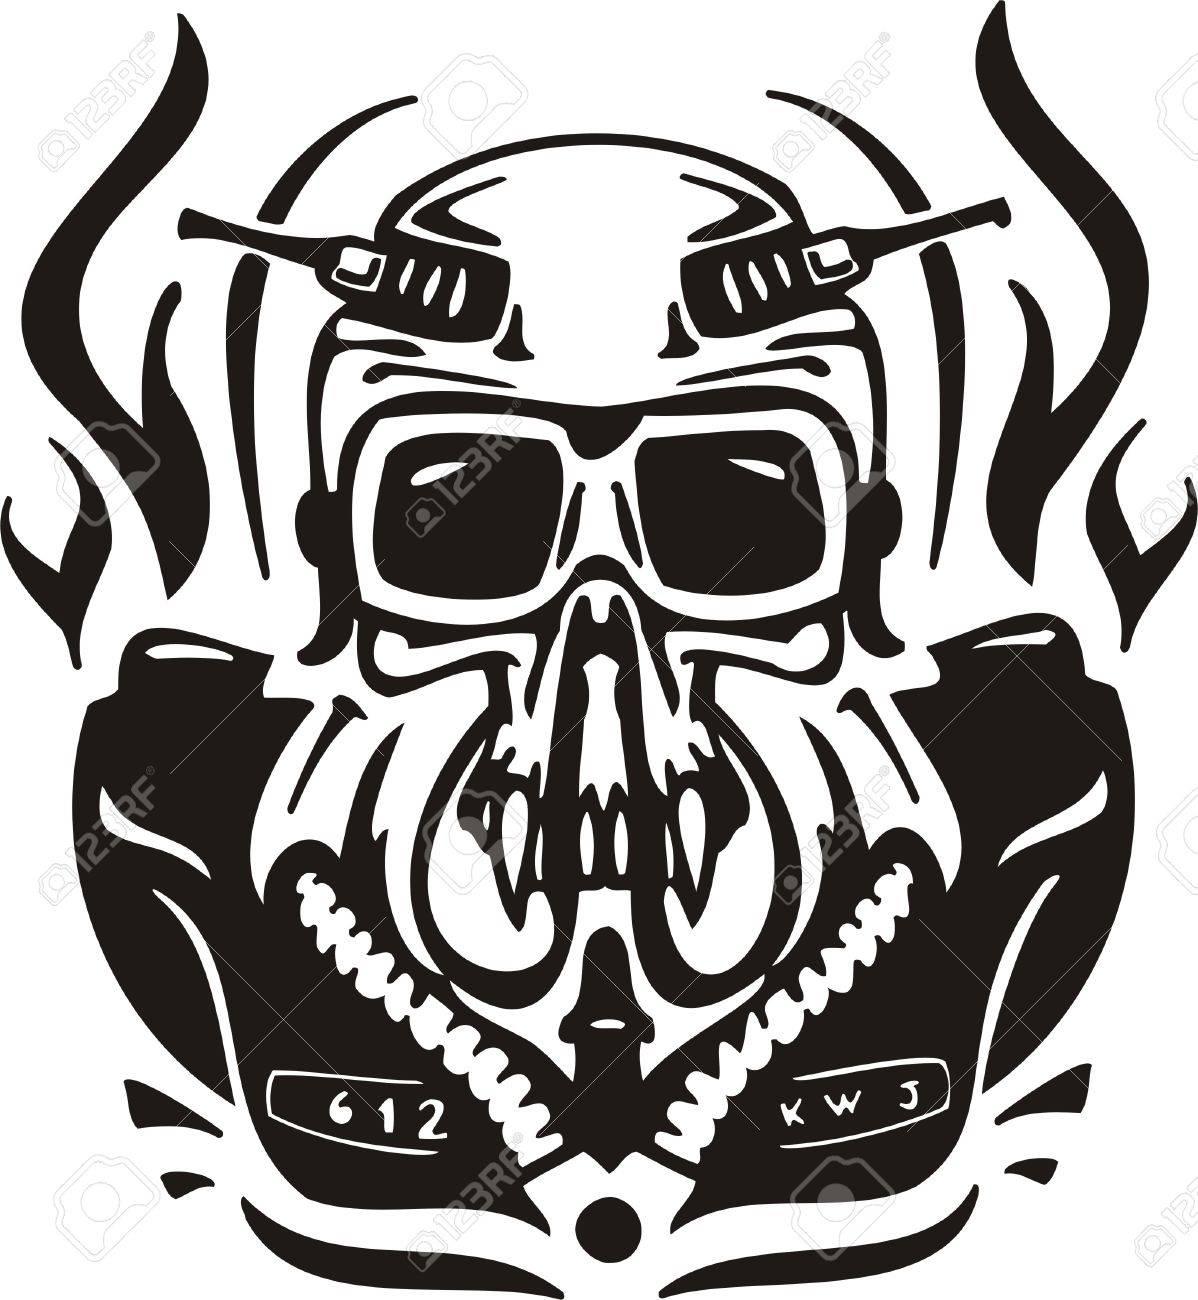 Cyber Skull - illustration. Ready for vinyl cutting. Stock Vector - 8132085